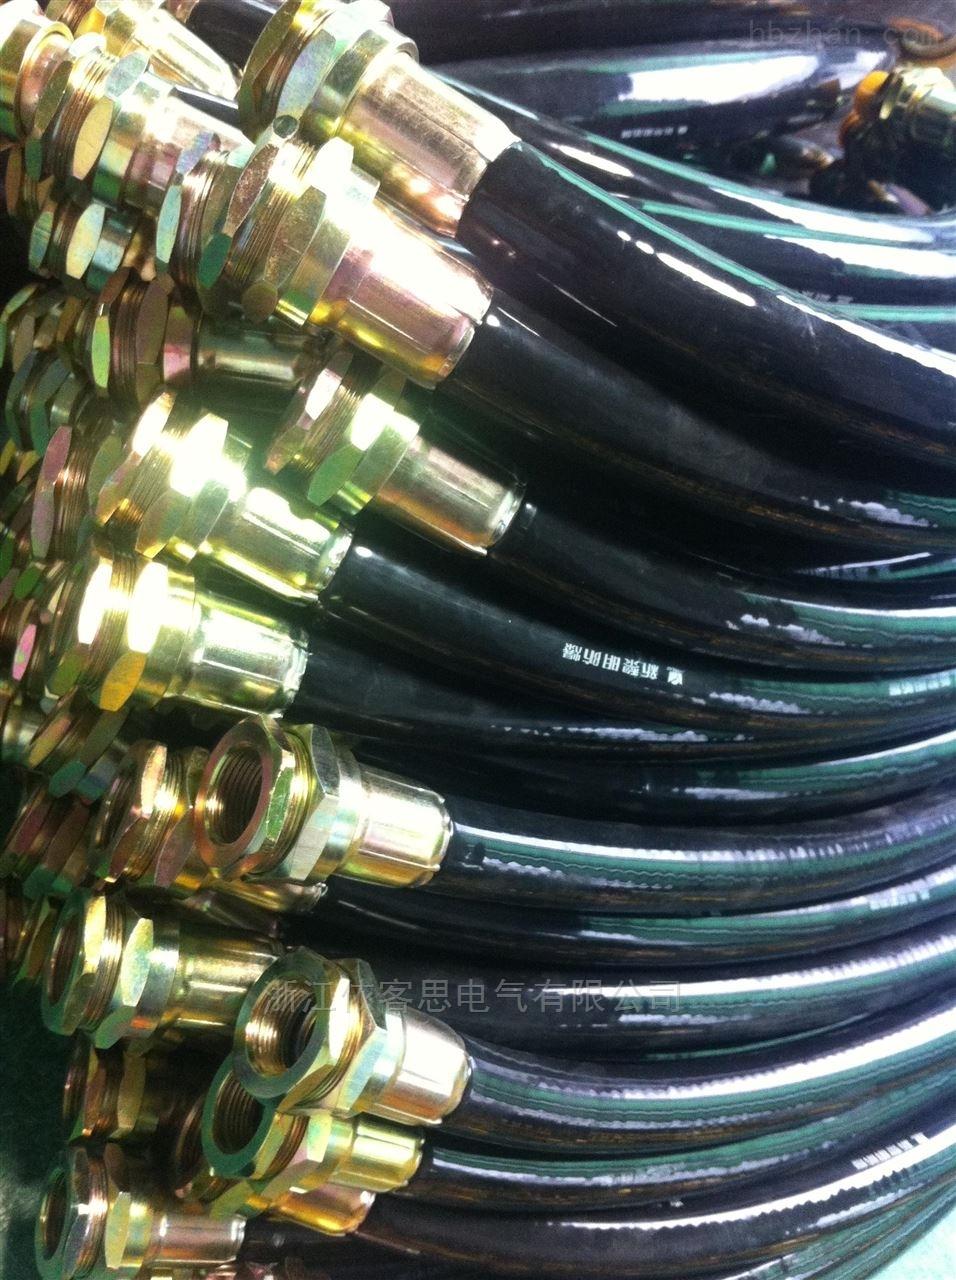 BNG防爆挠性接线管G3/4''内 M20*1.5外L700